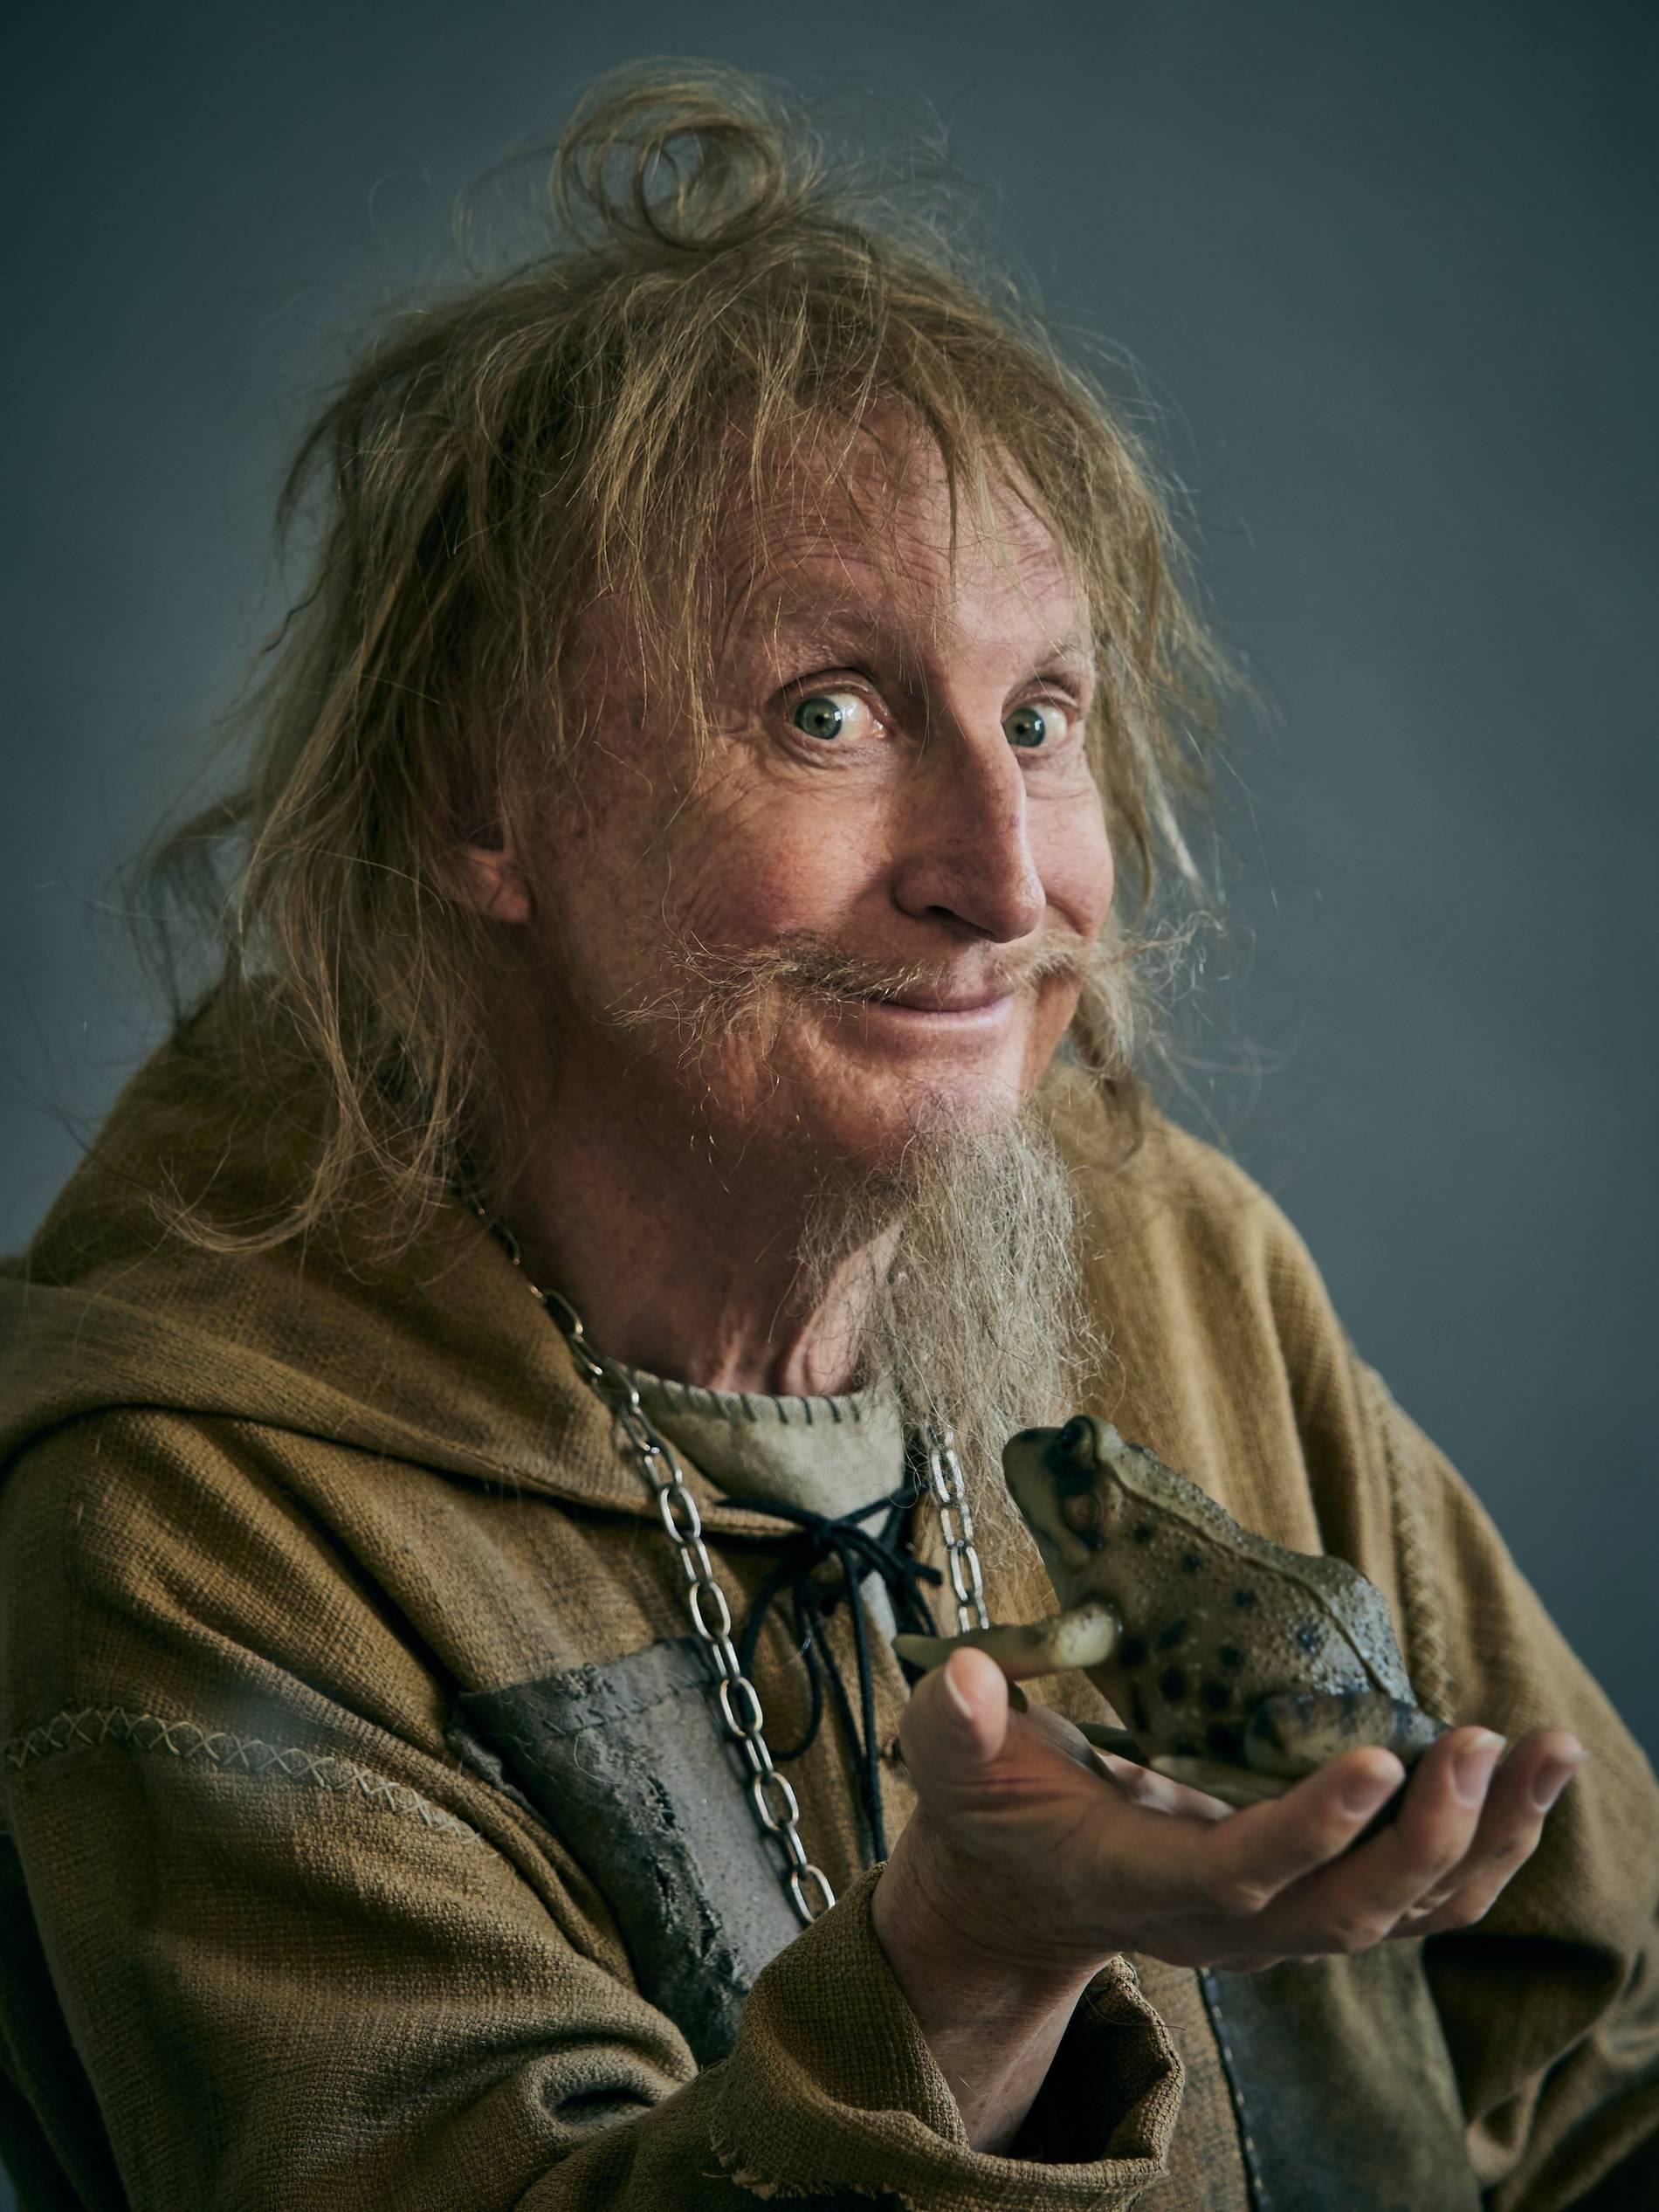 Filmstadt Stolberg: Otto Waalkes als Catweazle, aber ohne